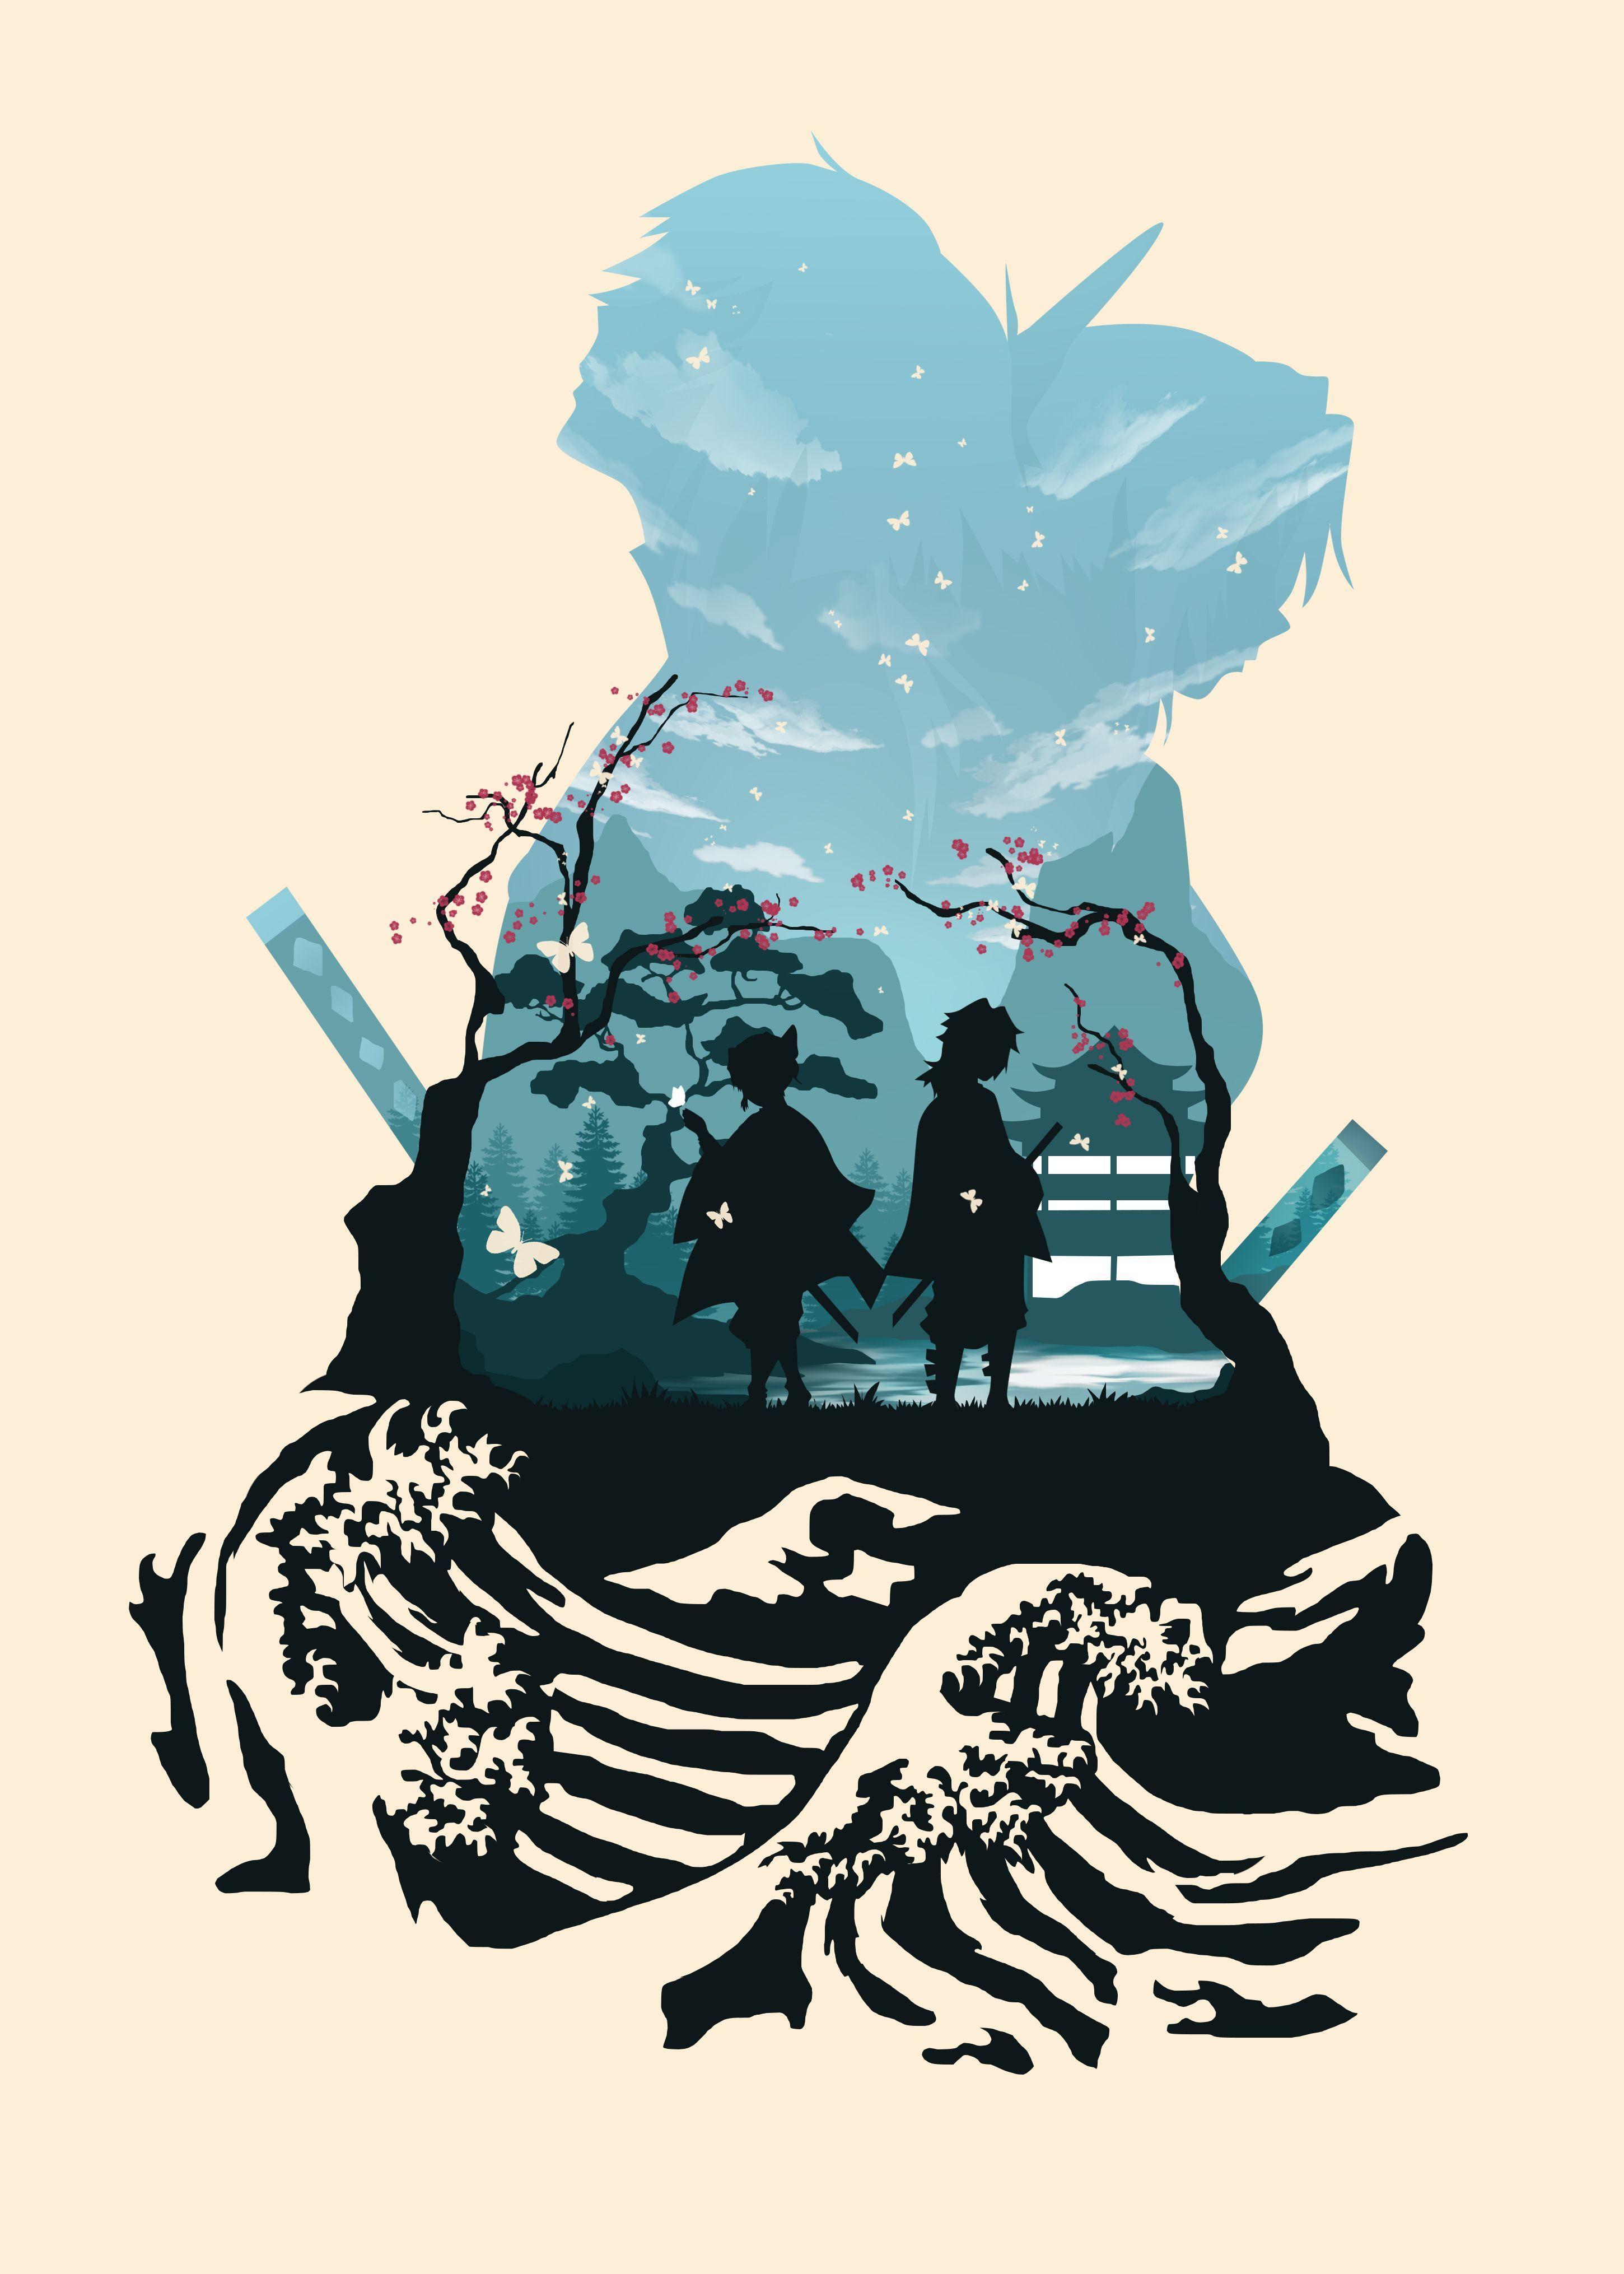 Giyu Tomioka An d Shinobu Kochokoo l Wal Paper inn S Airer Kimetsu no Yaiba |Anime Art | Displate thumbnail